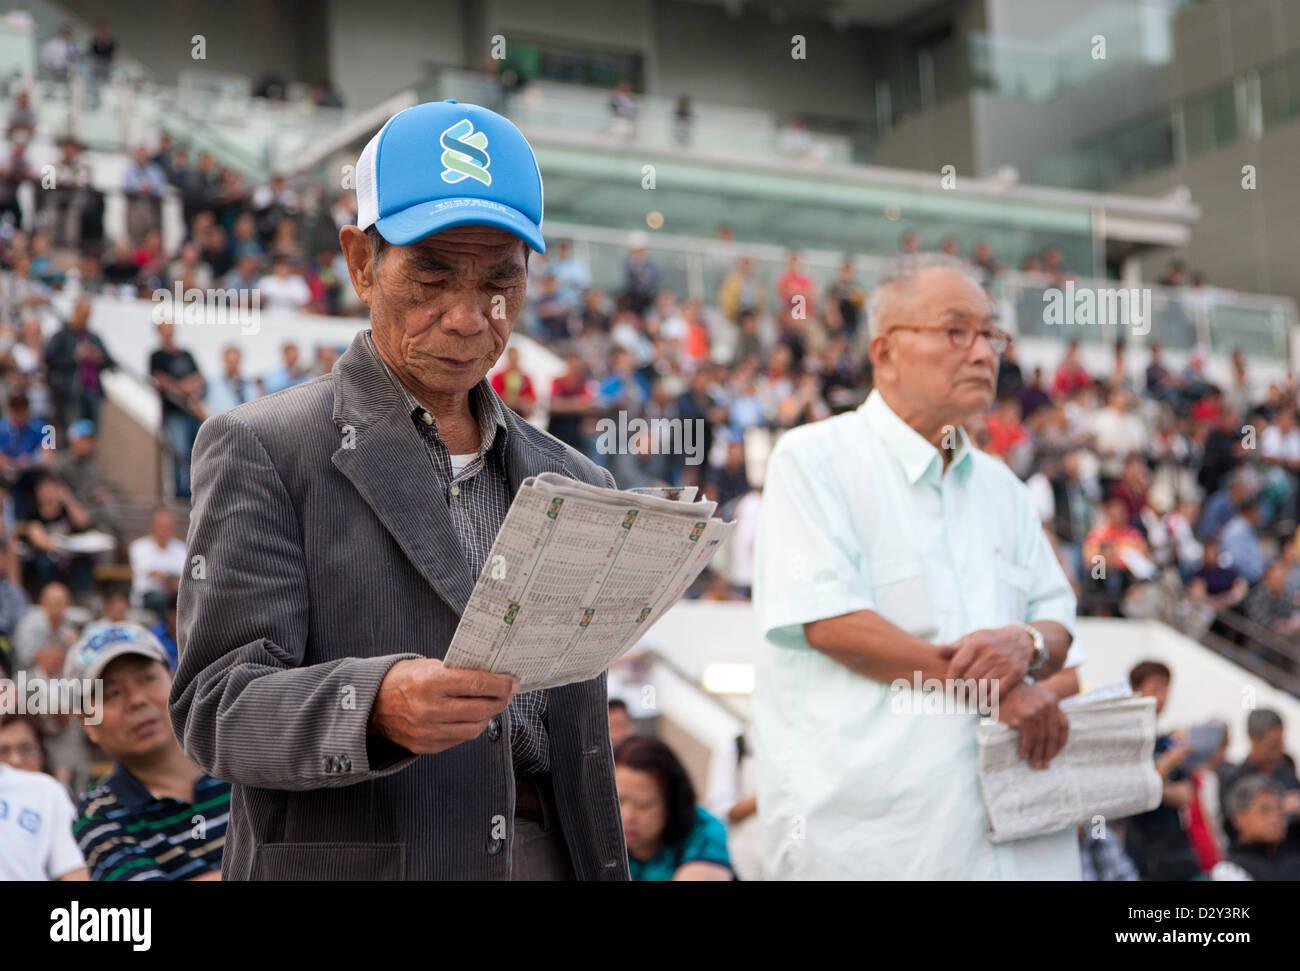 Sha Tin horse racecourse in Hong Kong, China - Stock Image